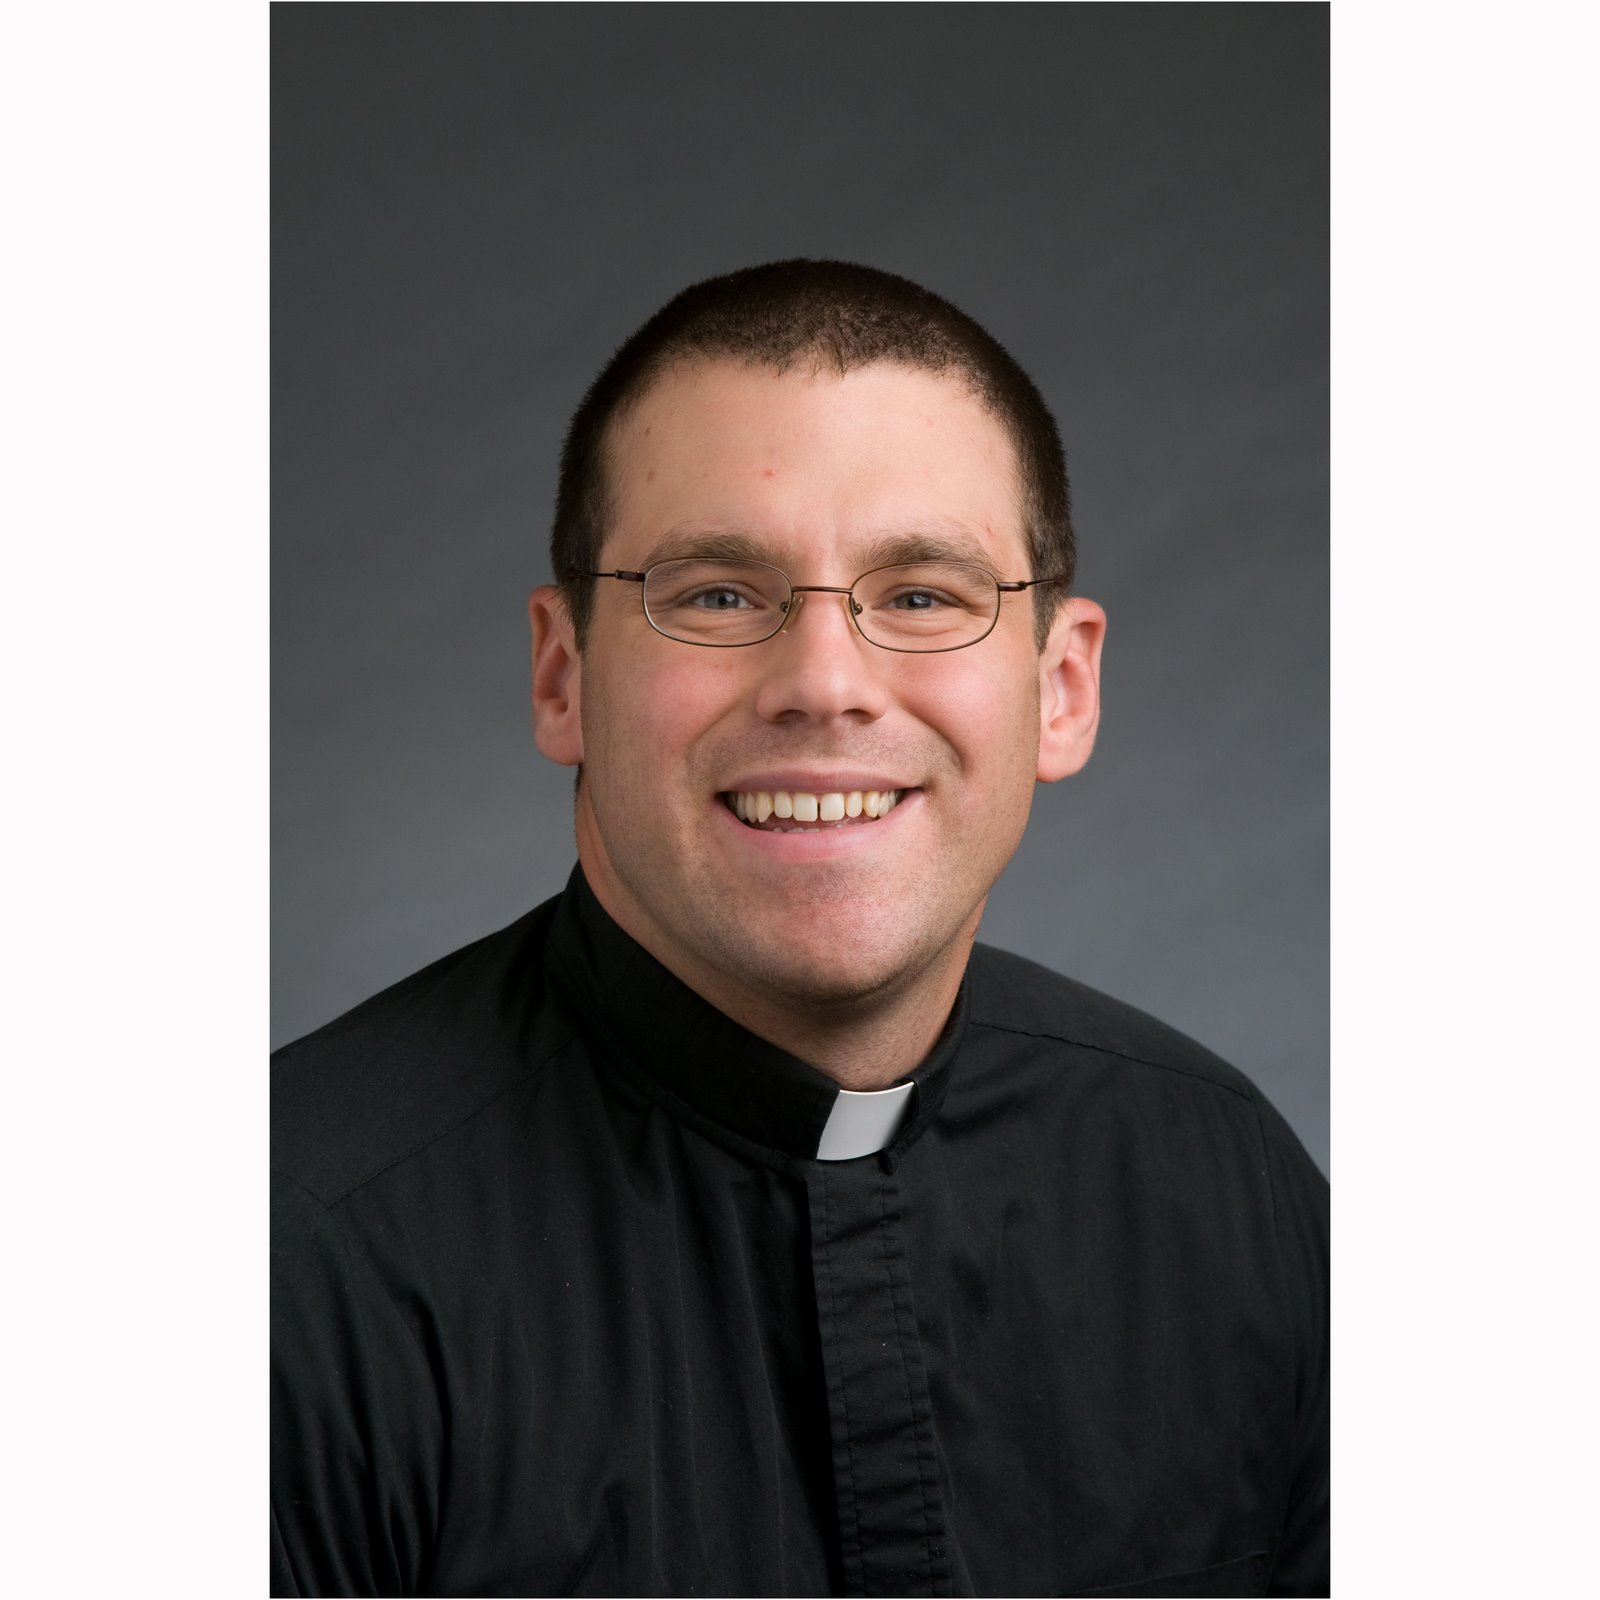 Jeffrey M. Rott, 30,